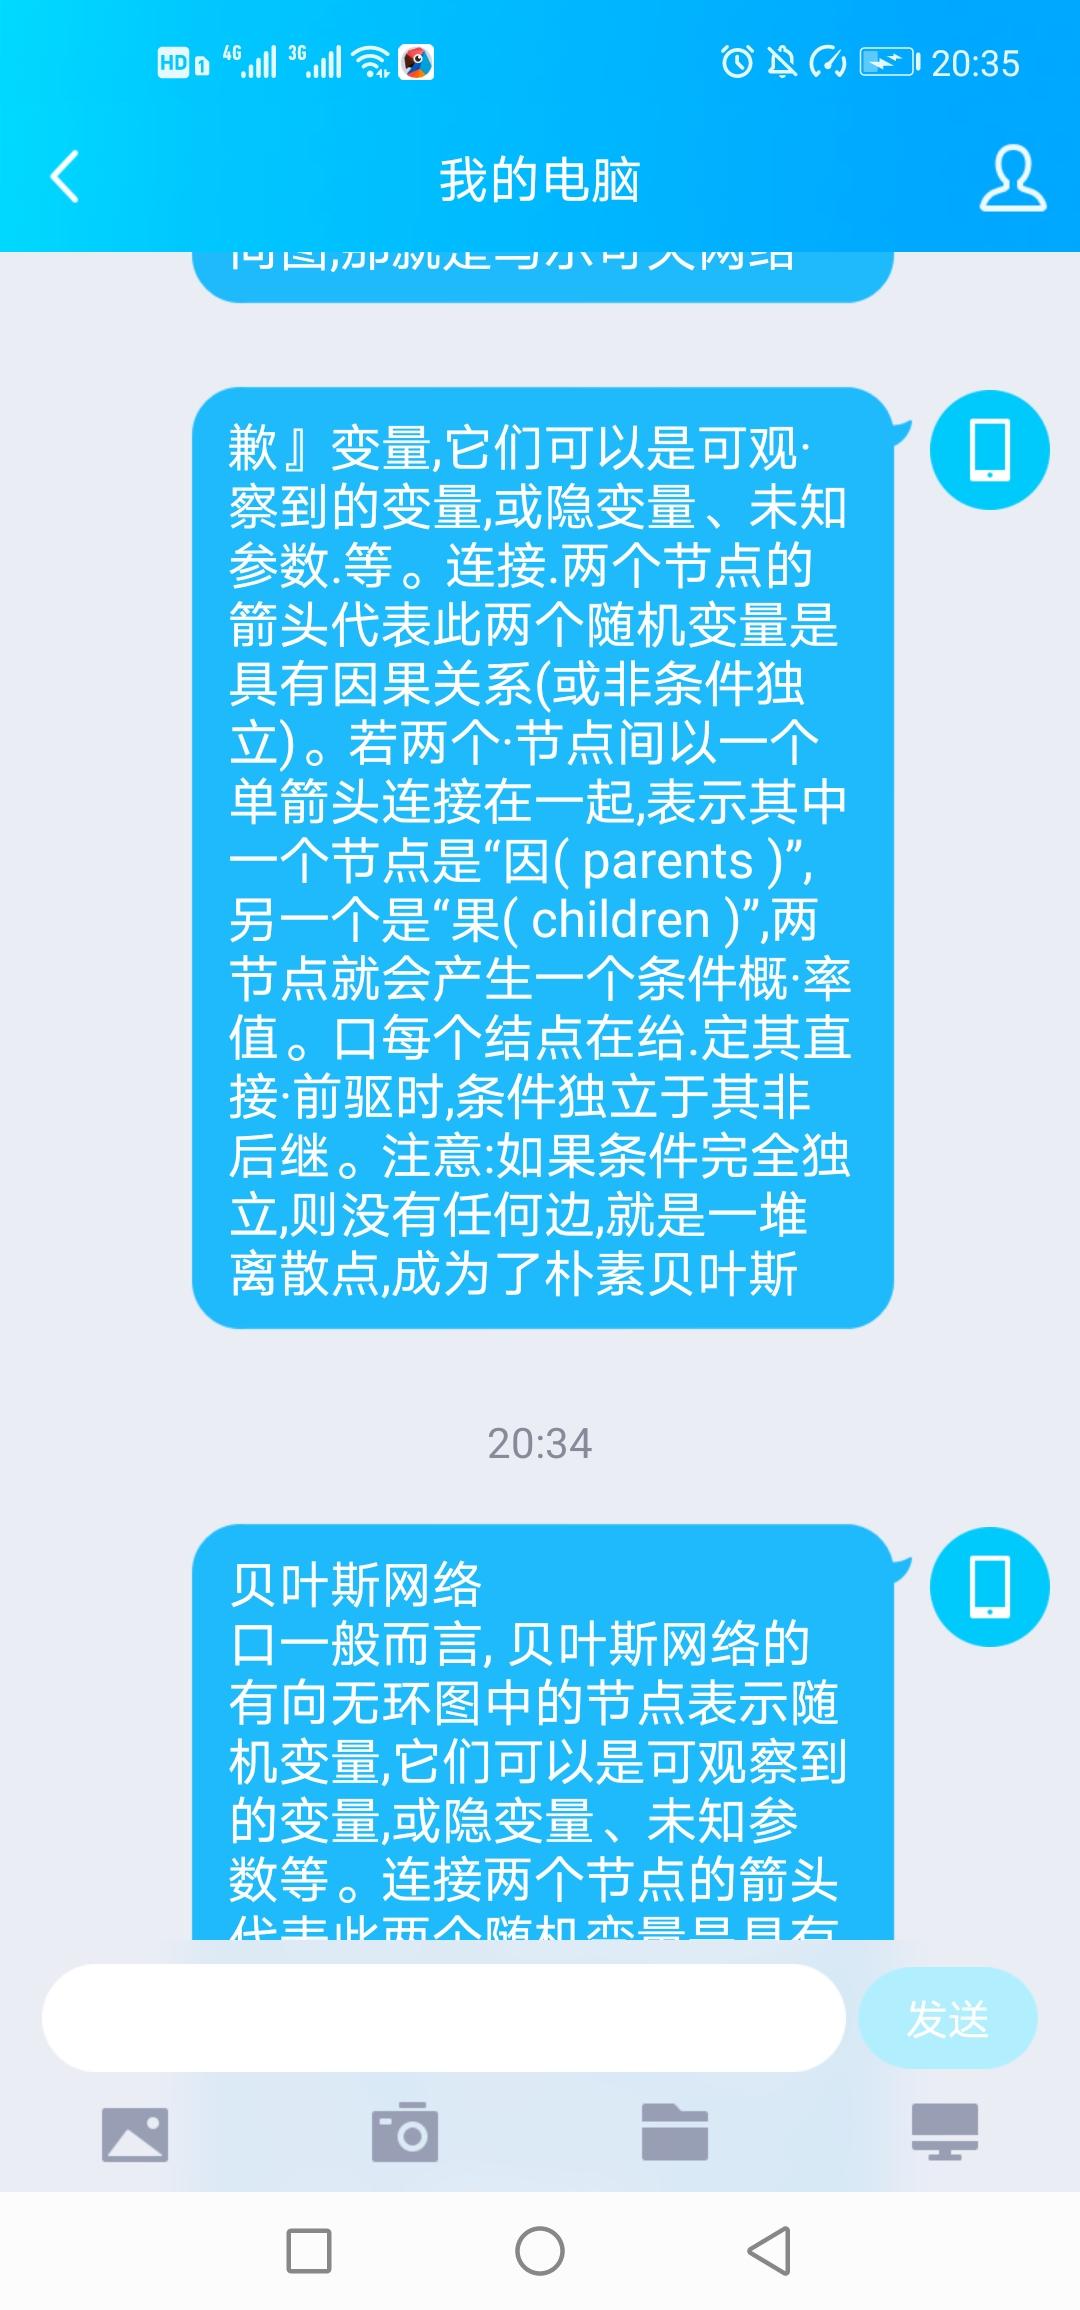 Screenshot_20200330_203512_com.tencent.mobileqq.jpg